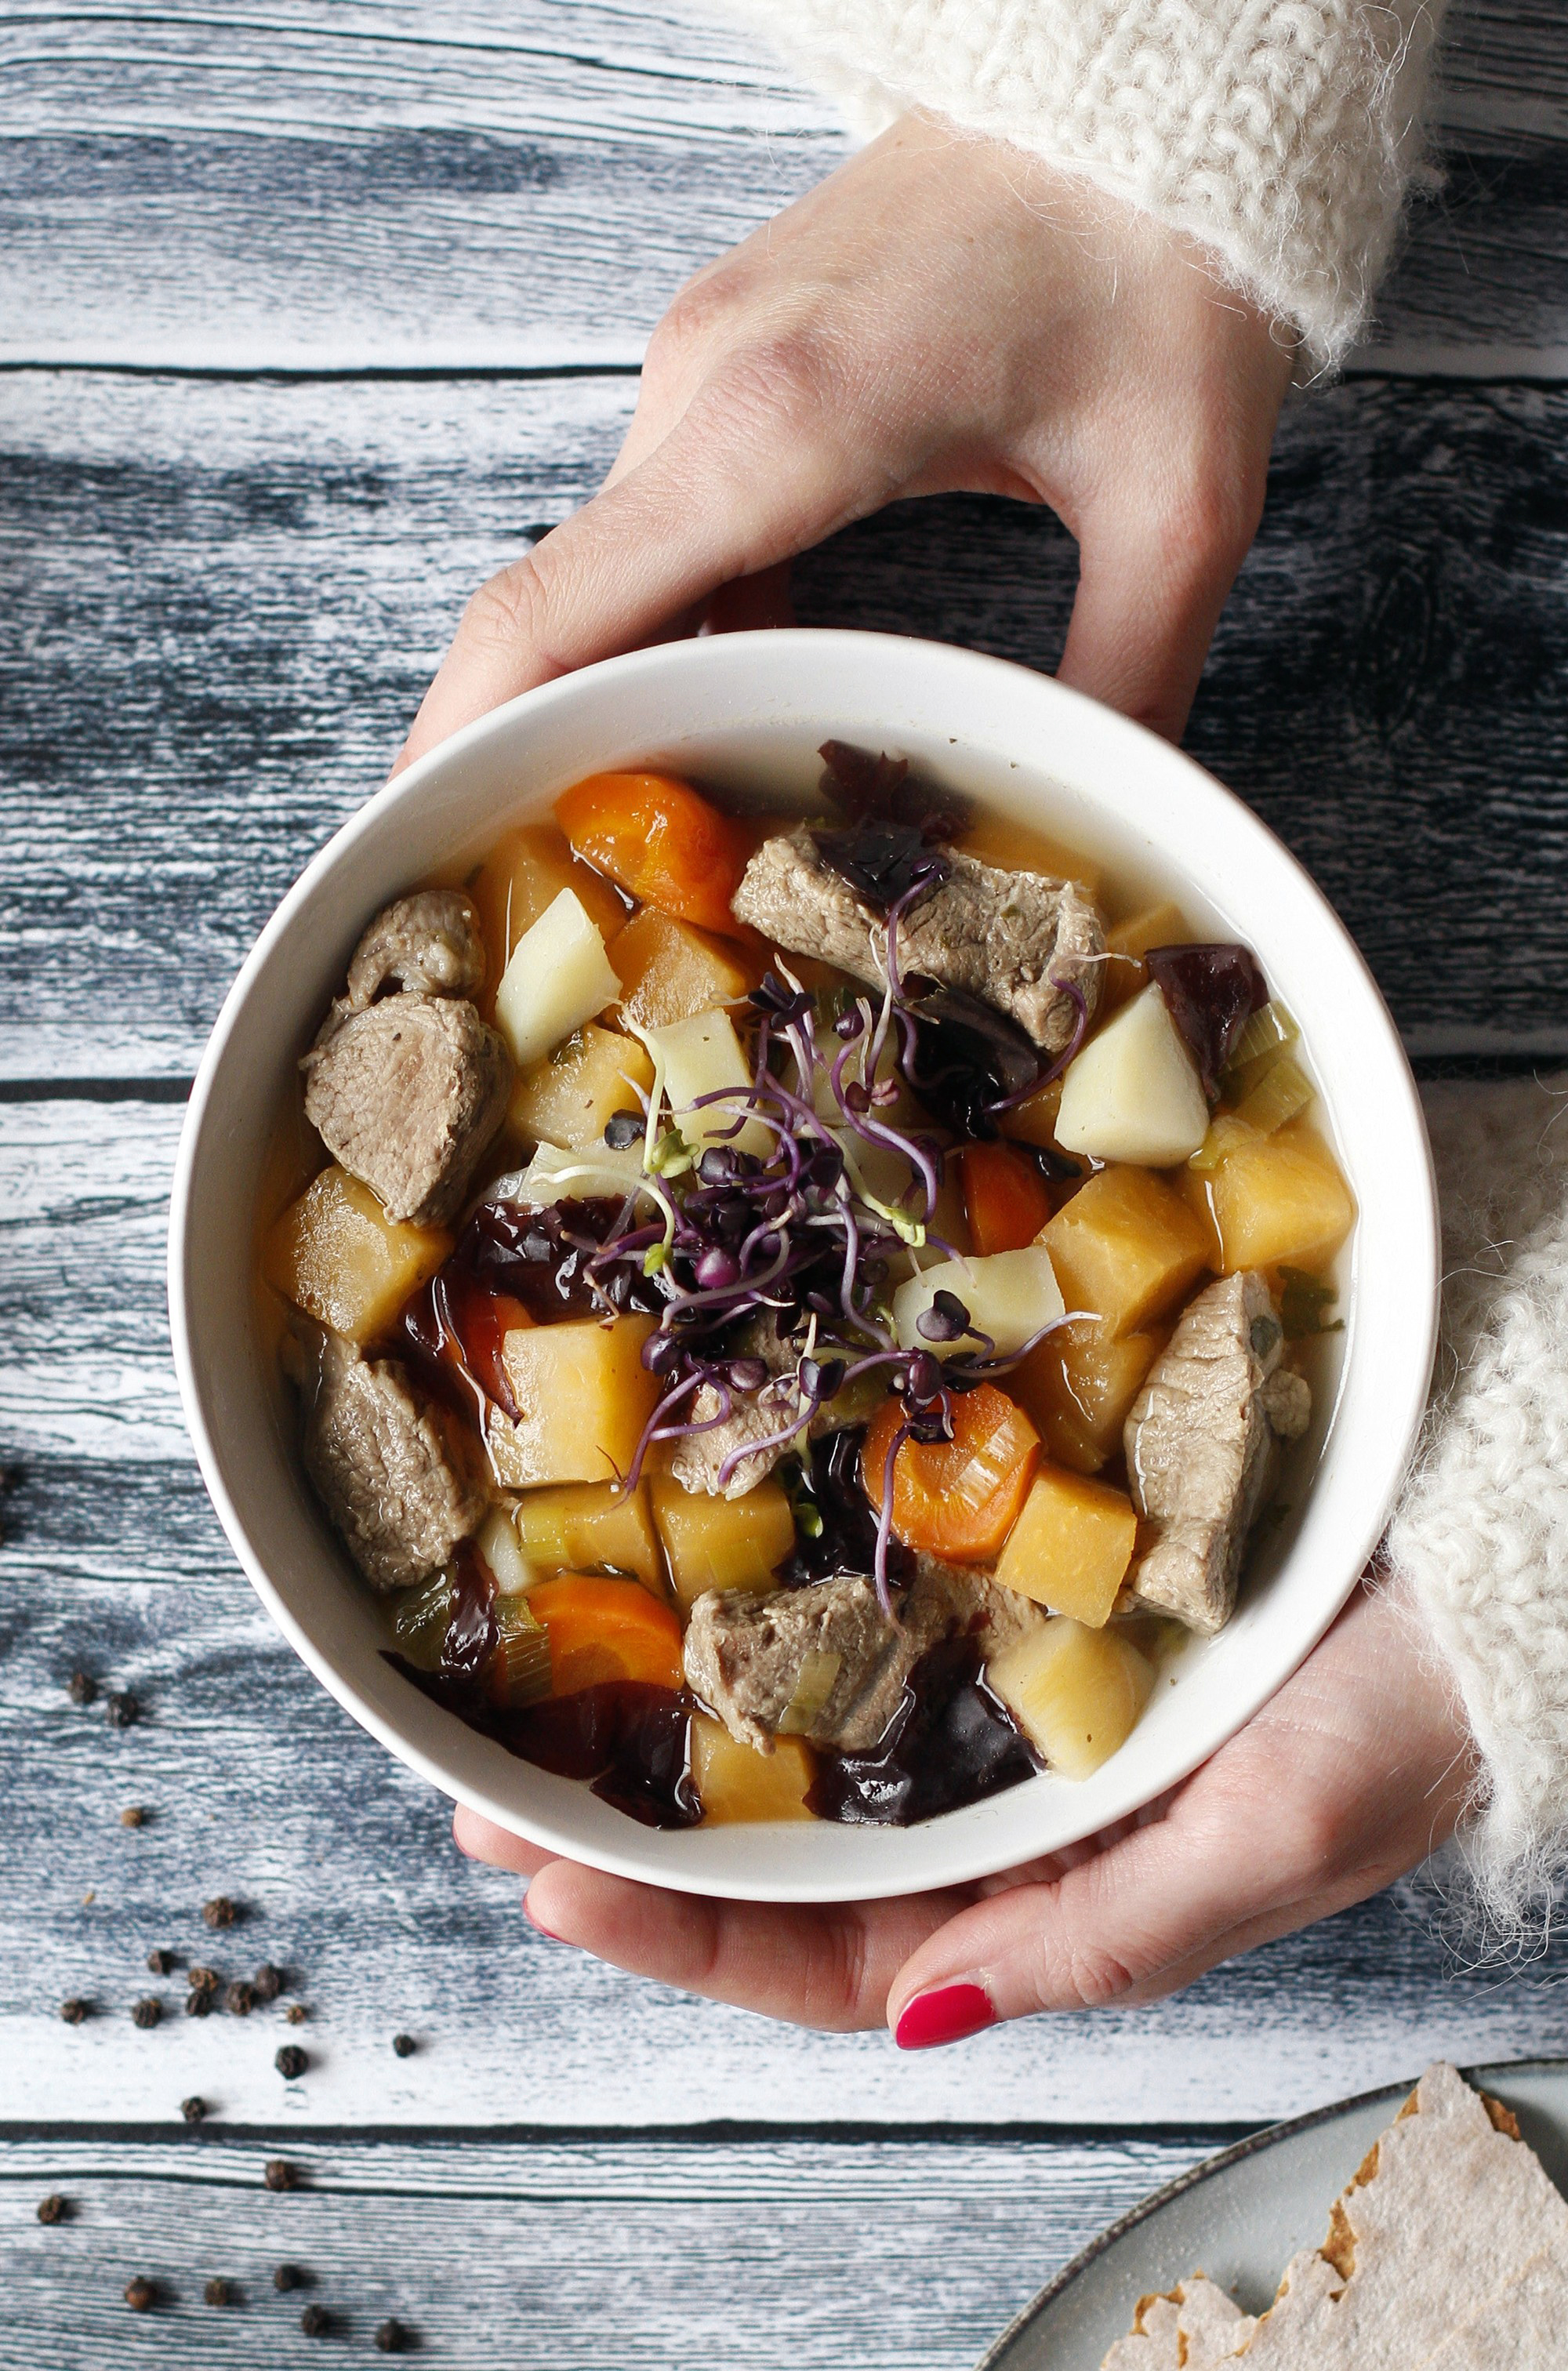 Kjötsúpa. Islandzka zupa mięsna